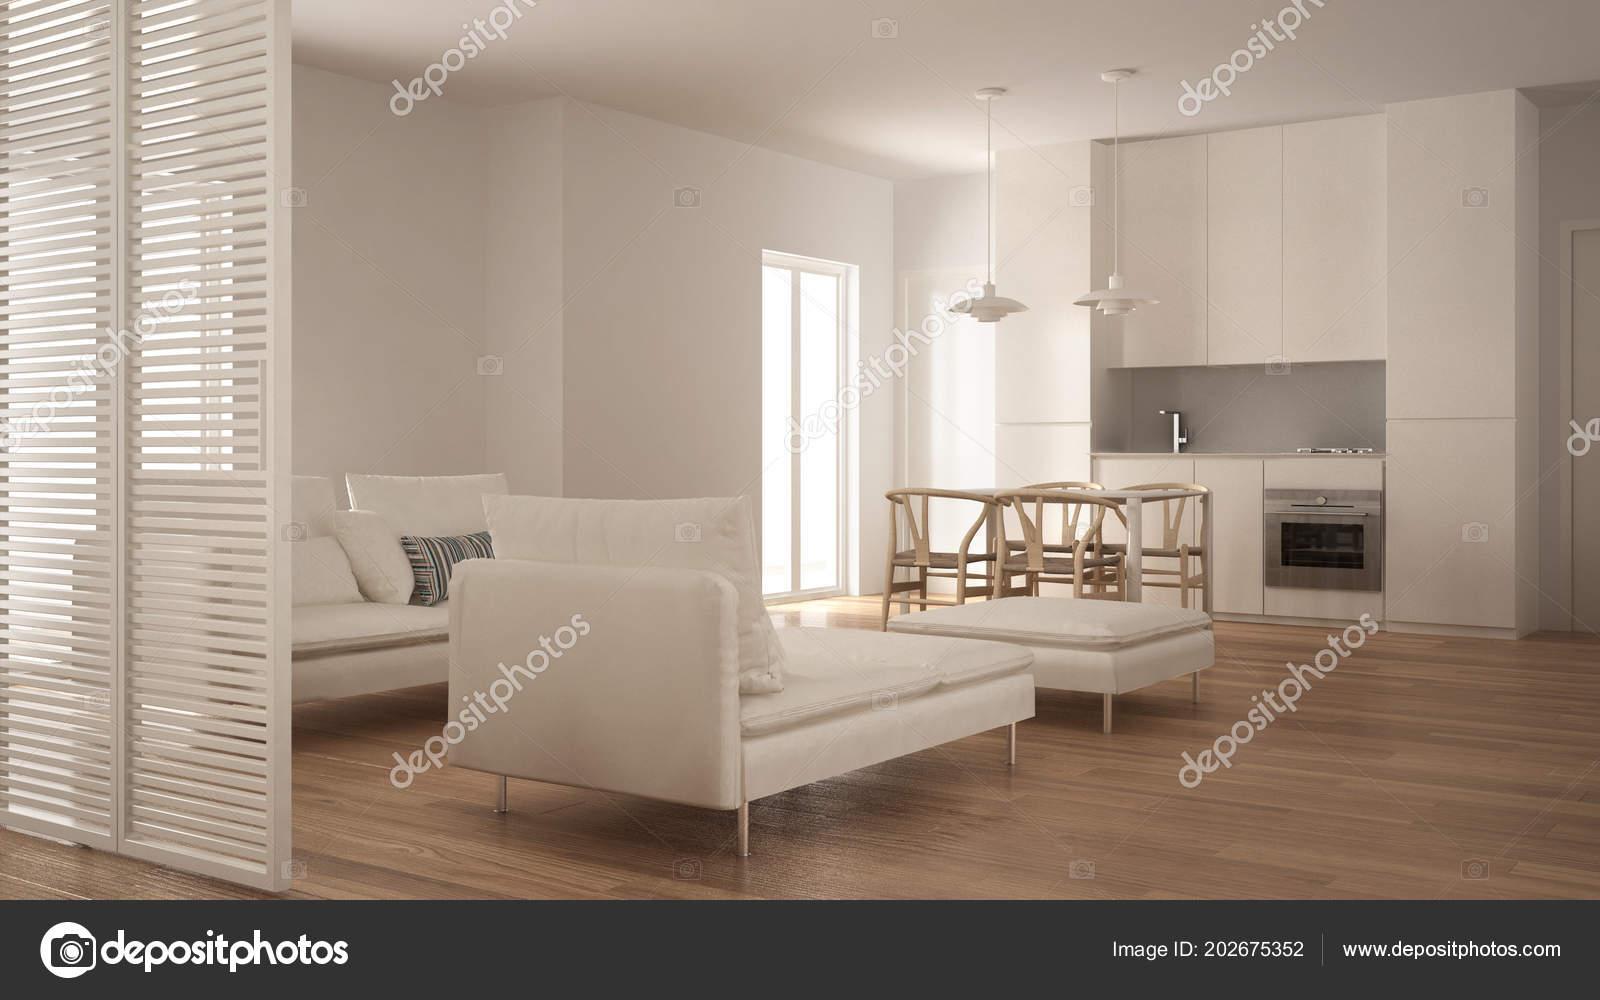 Moderne schone woonkamer met keuken eettafel bank poef chaise longue